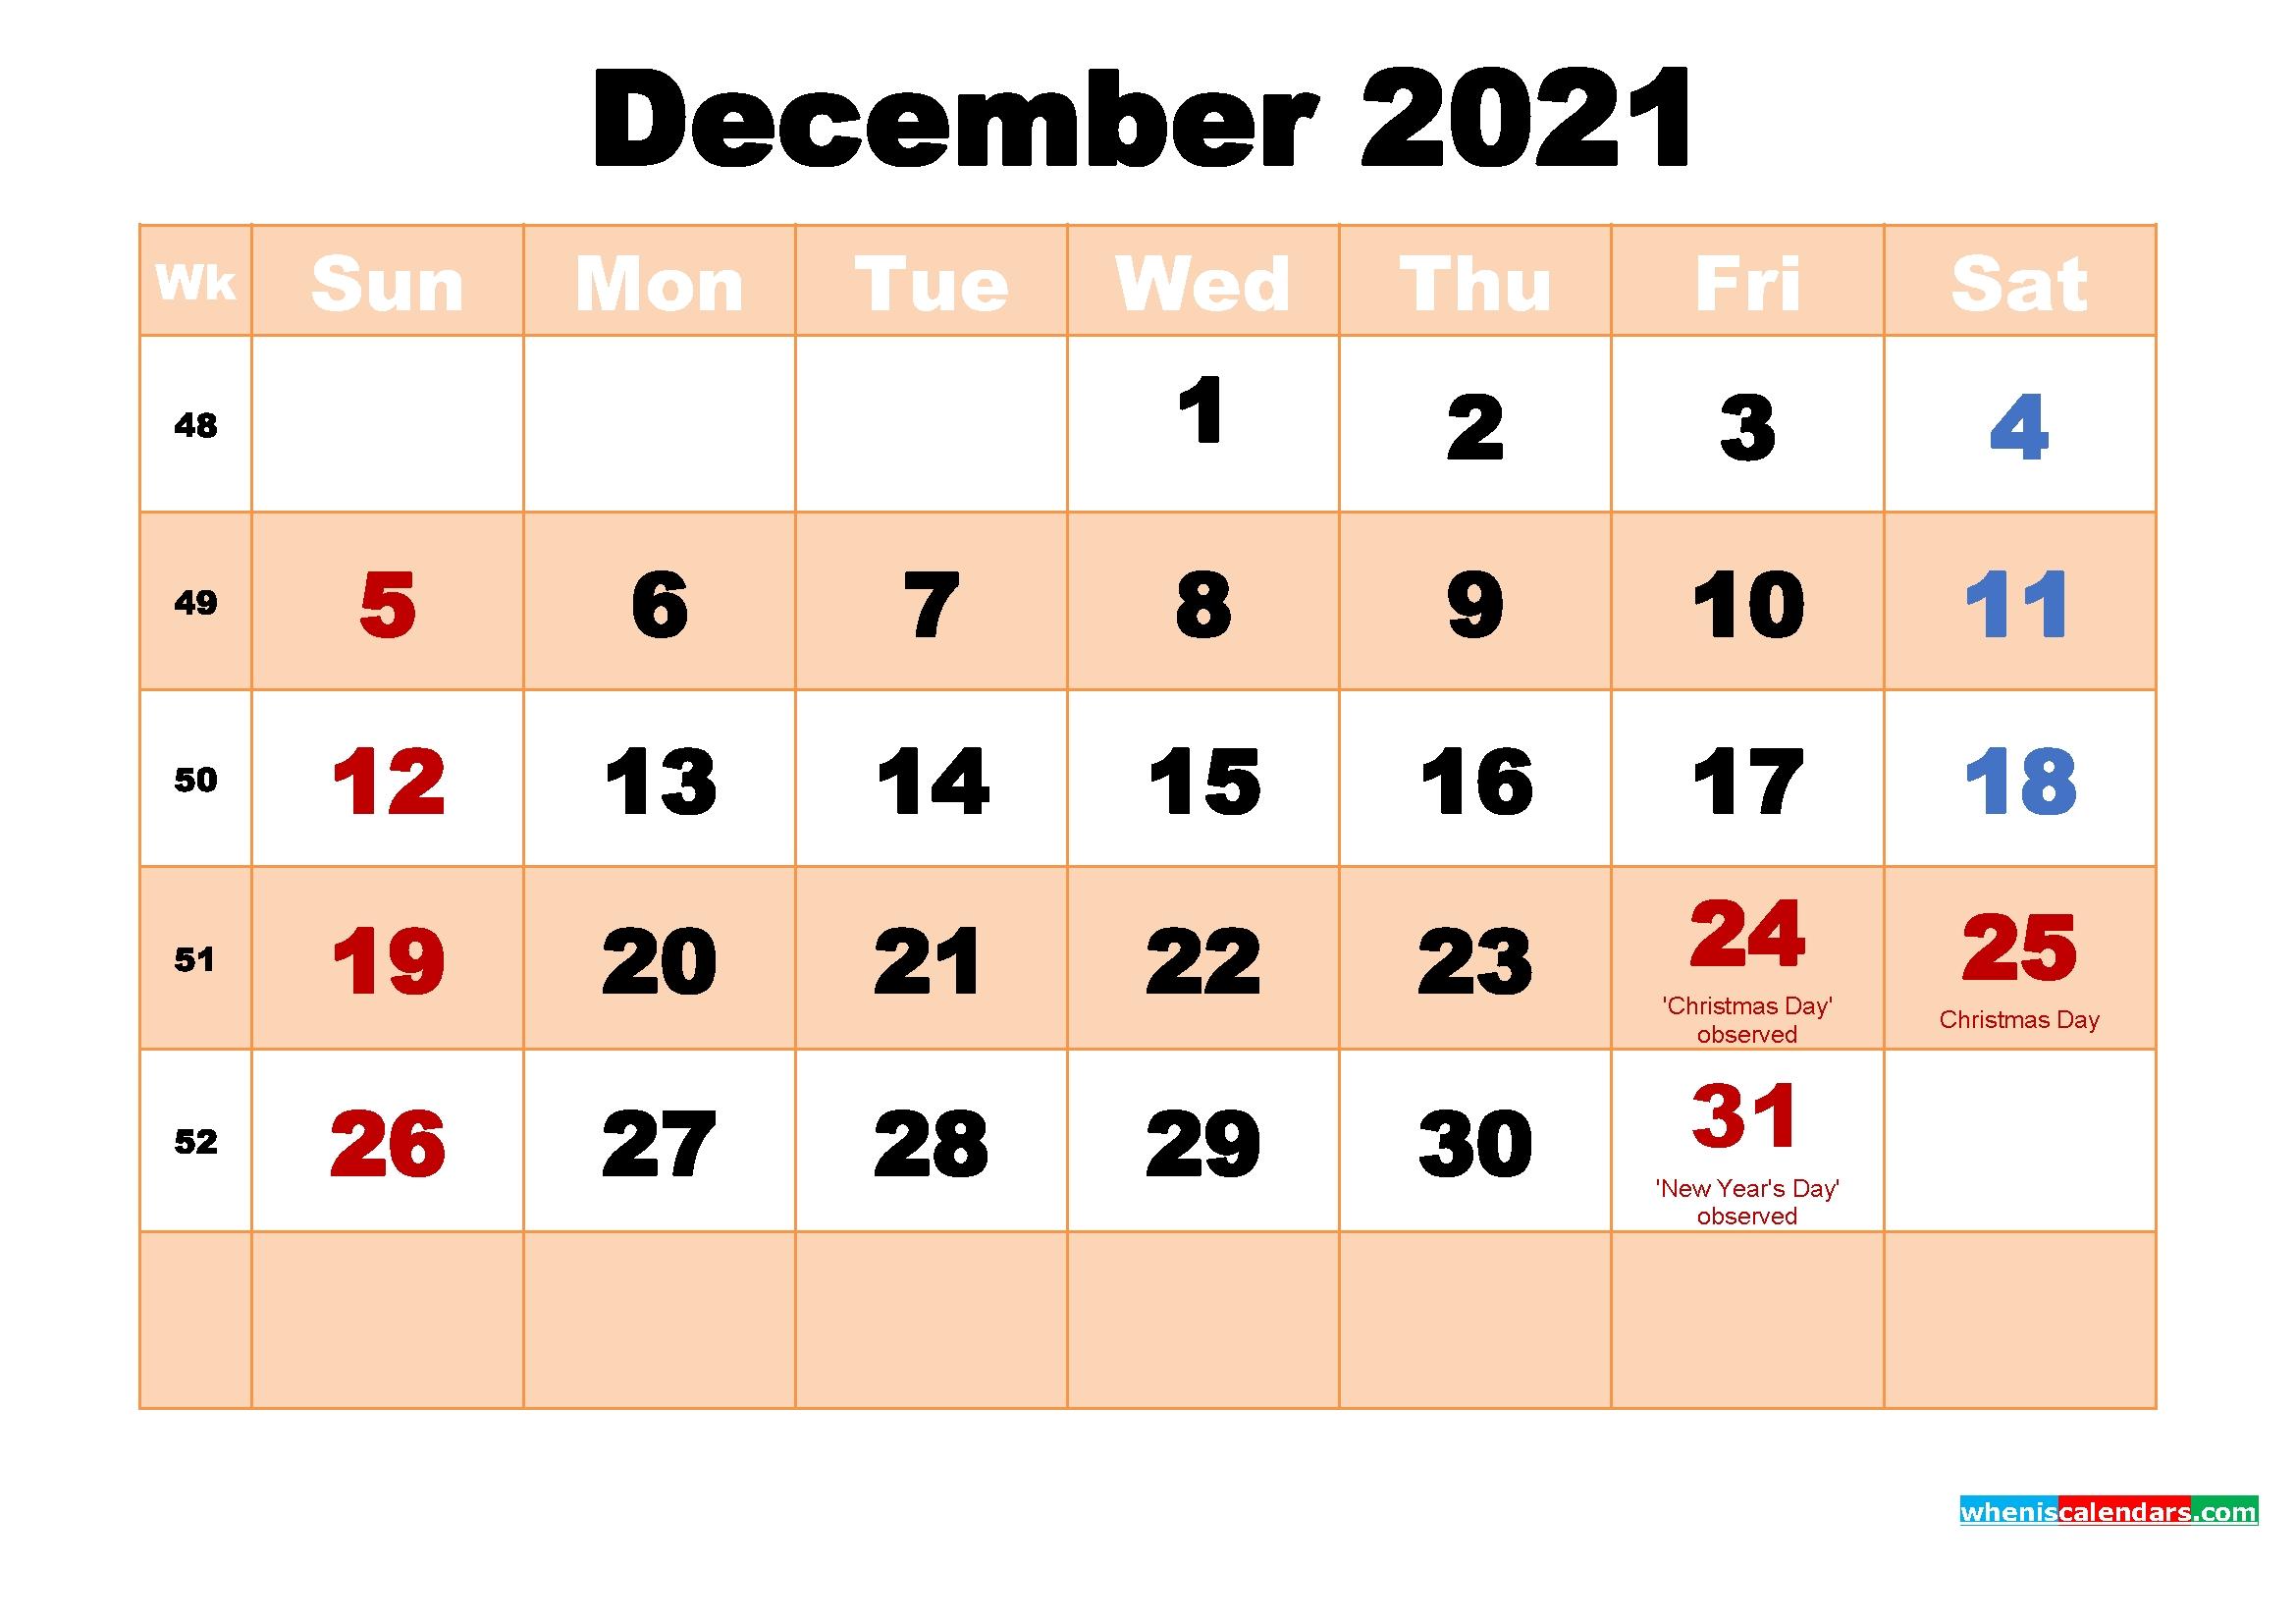 December 2021 Printable Calendar With Holidays | Free Printable 2020 Calendar With Holidays December 2021 Calendar Printable